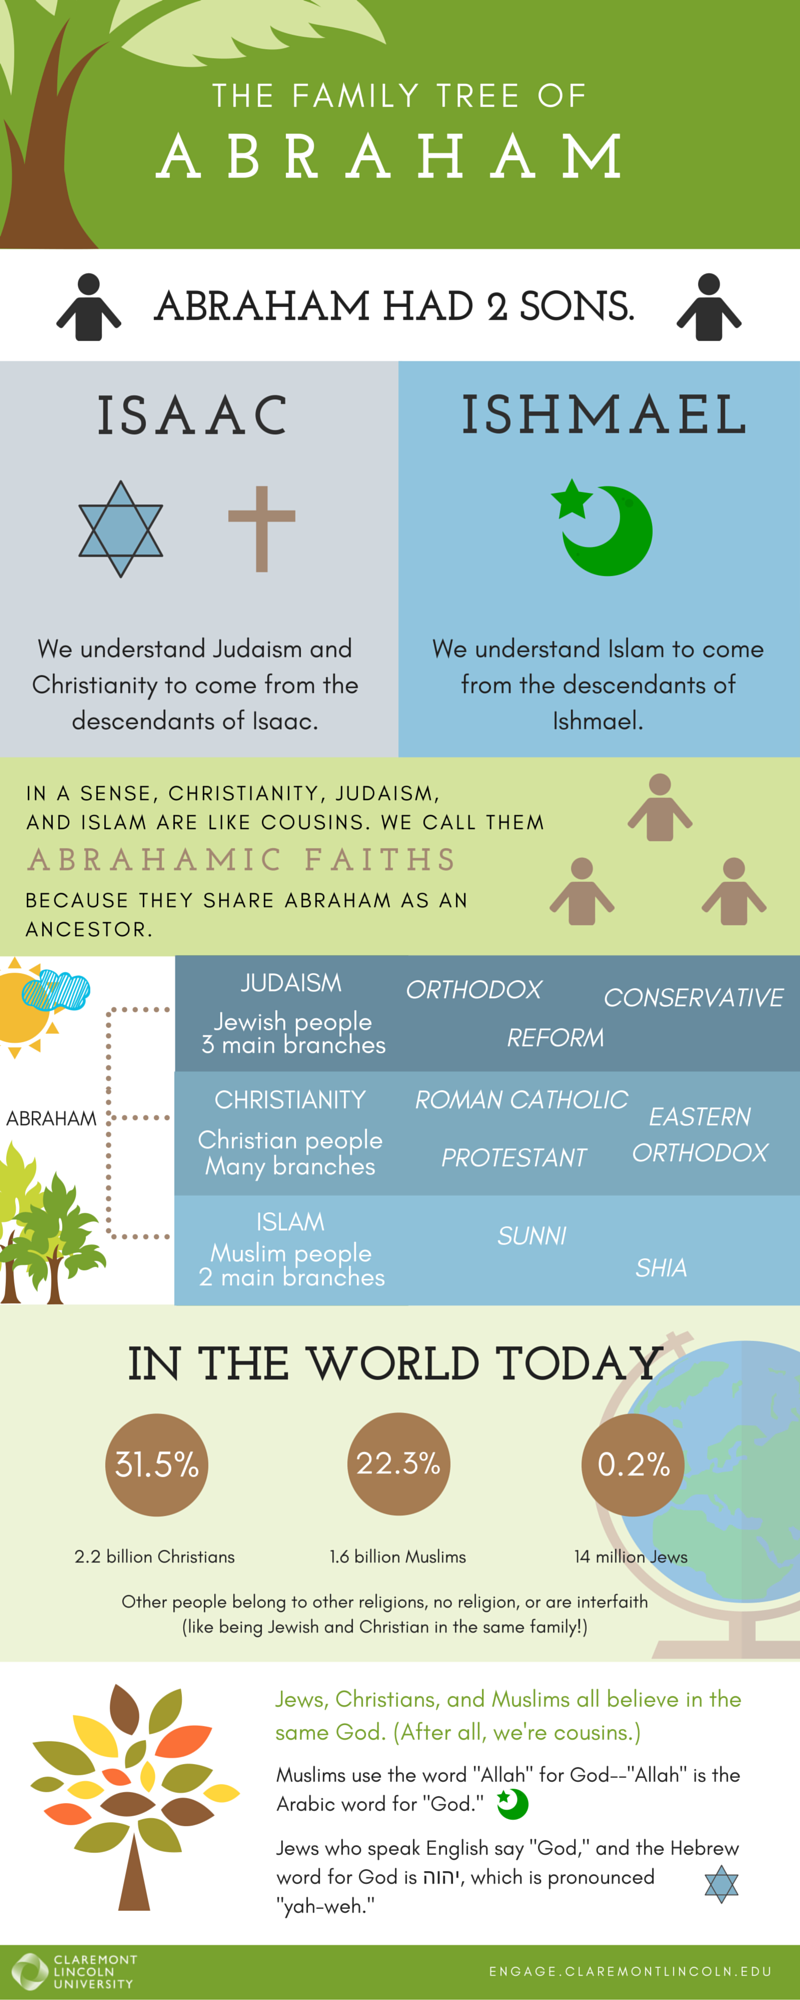 The Family Tree of Abraham - Interfaith Infographic